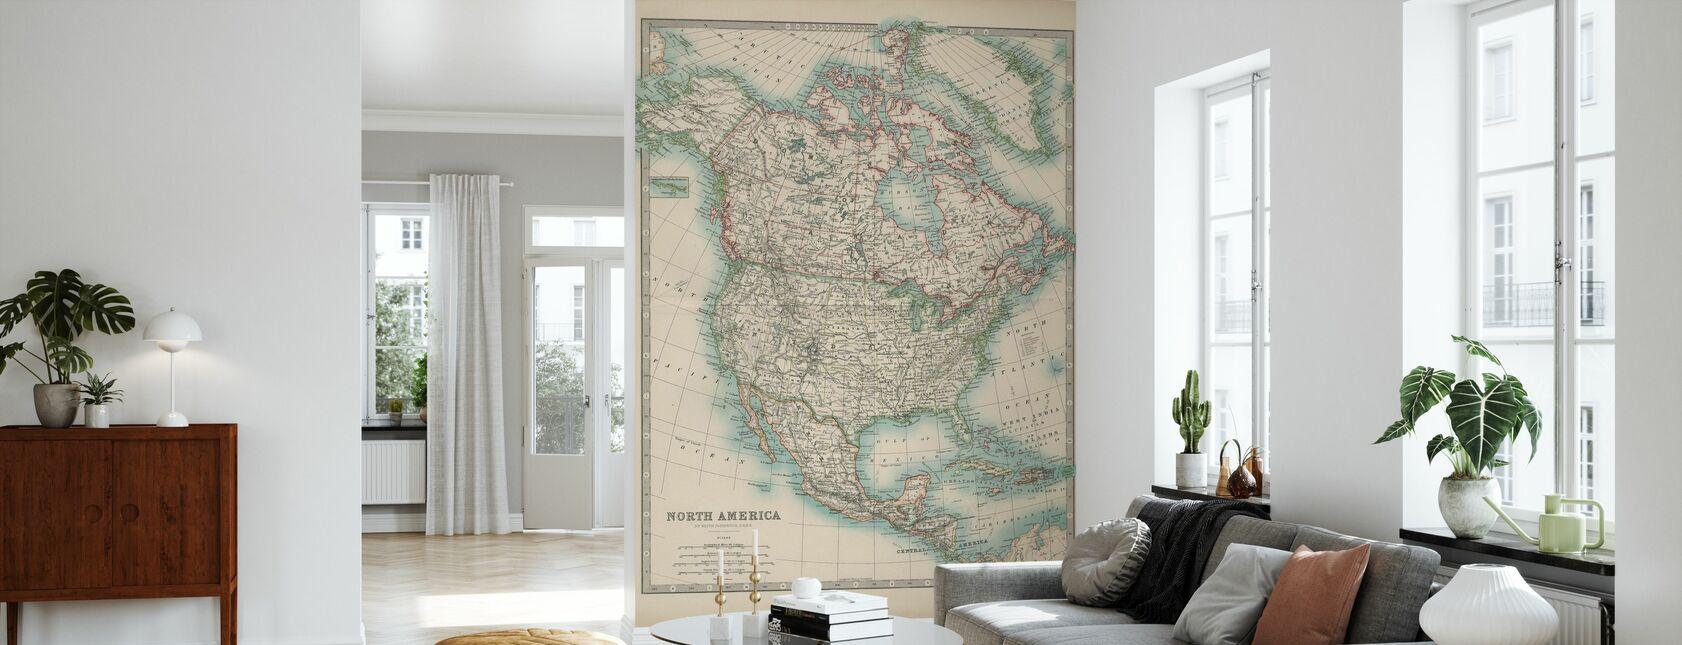 Johnstons Map of North America - Wallpaper - Living Room